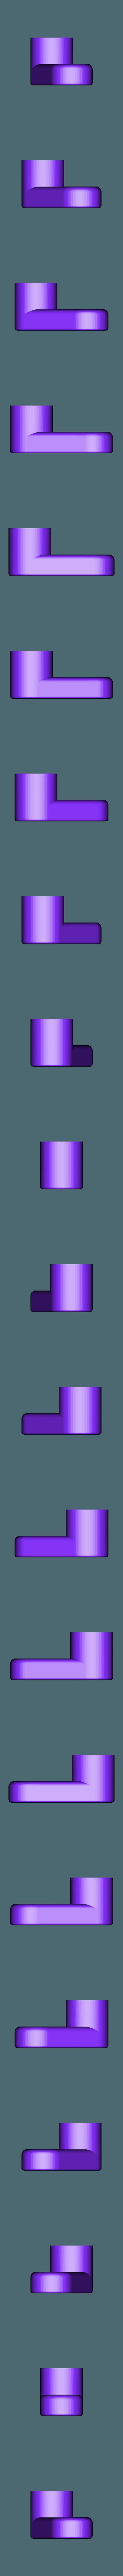 plexiglass_lock.stl Download free STL file OMG oh no yet another lack enclosure • 3D printable template, kumekay